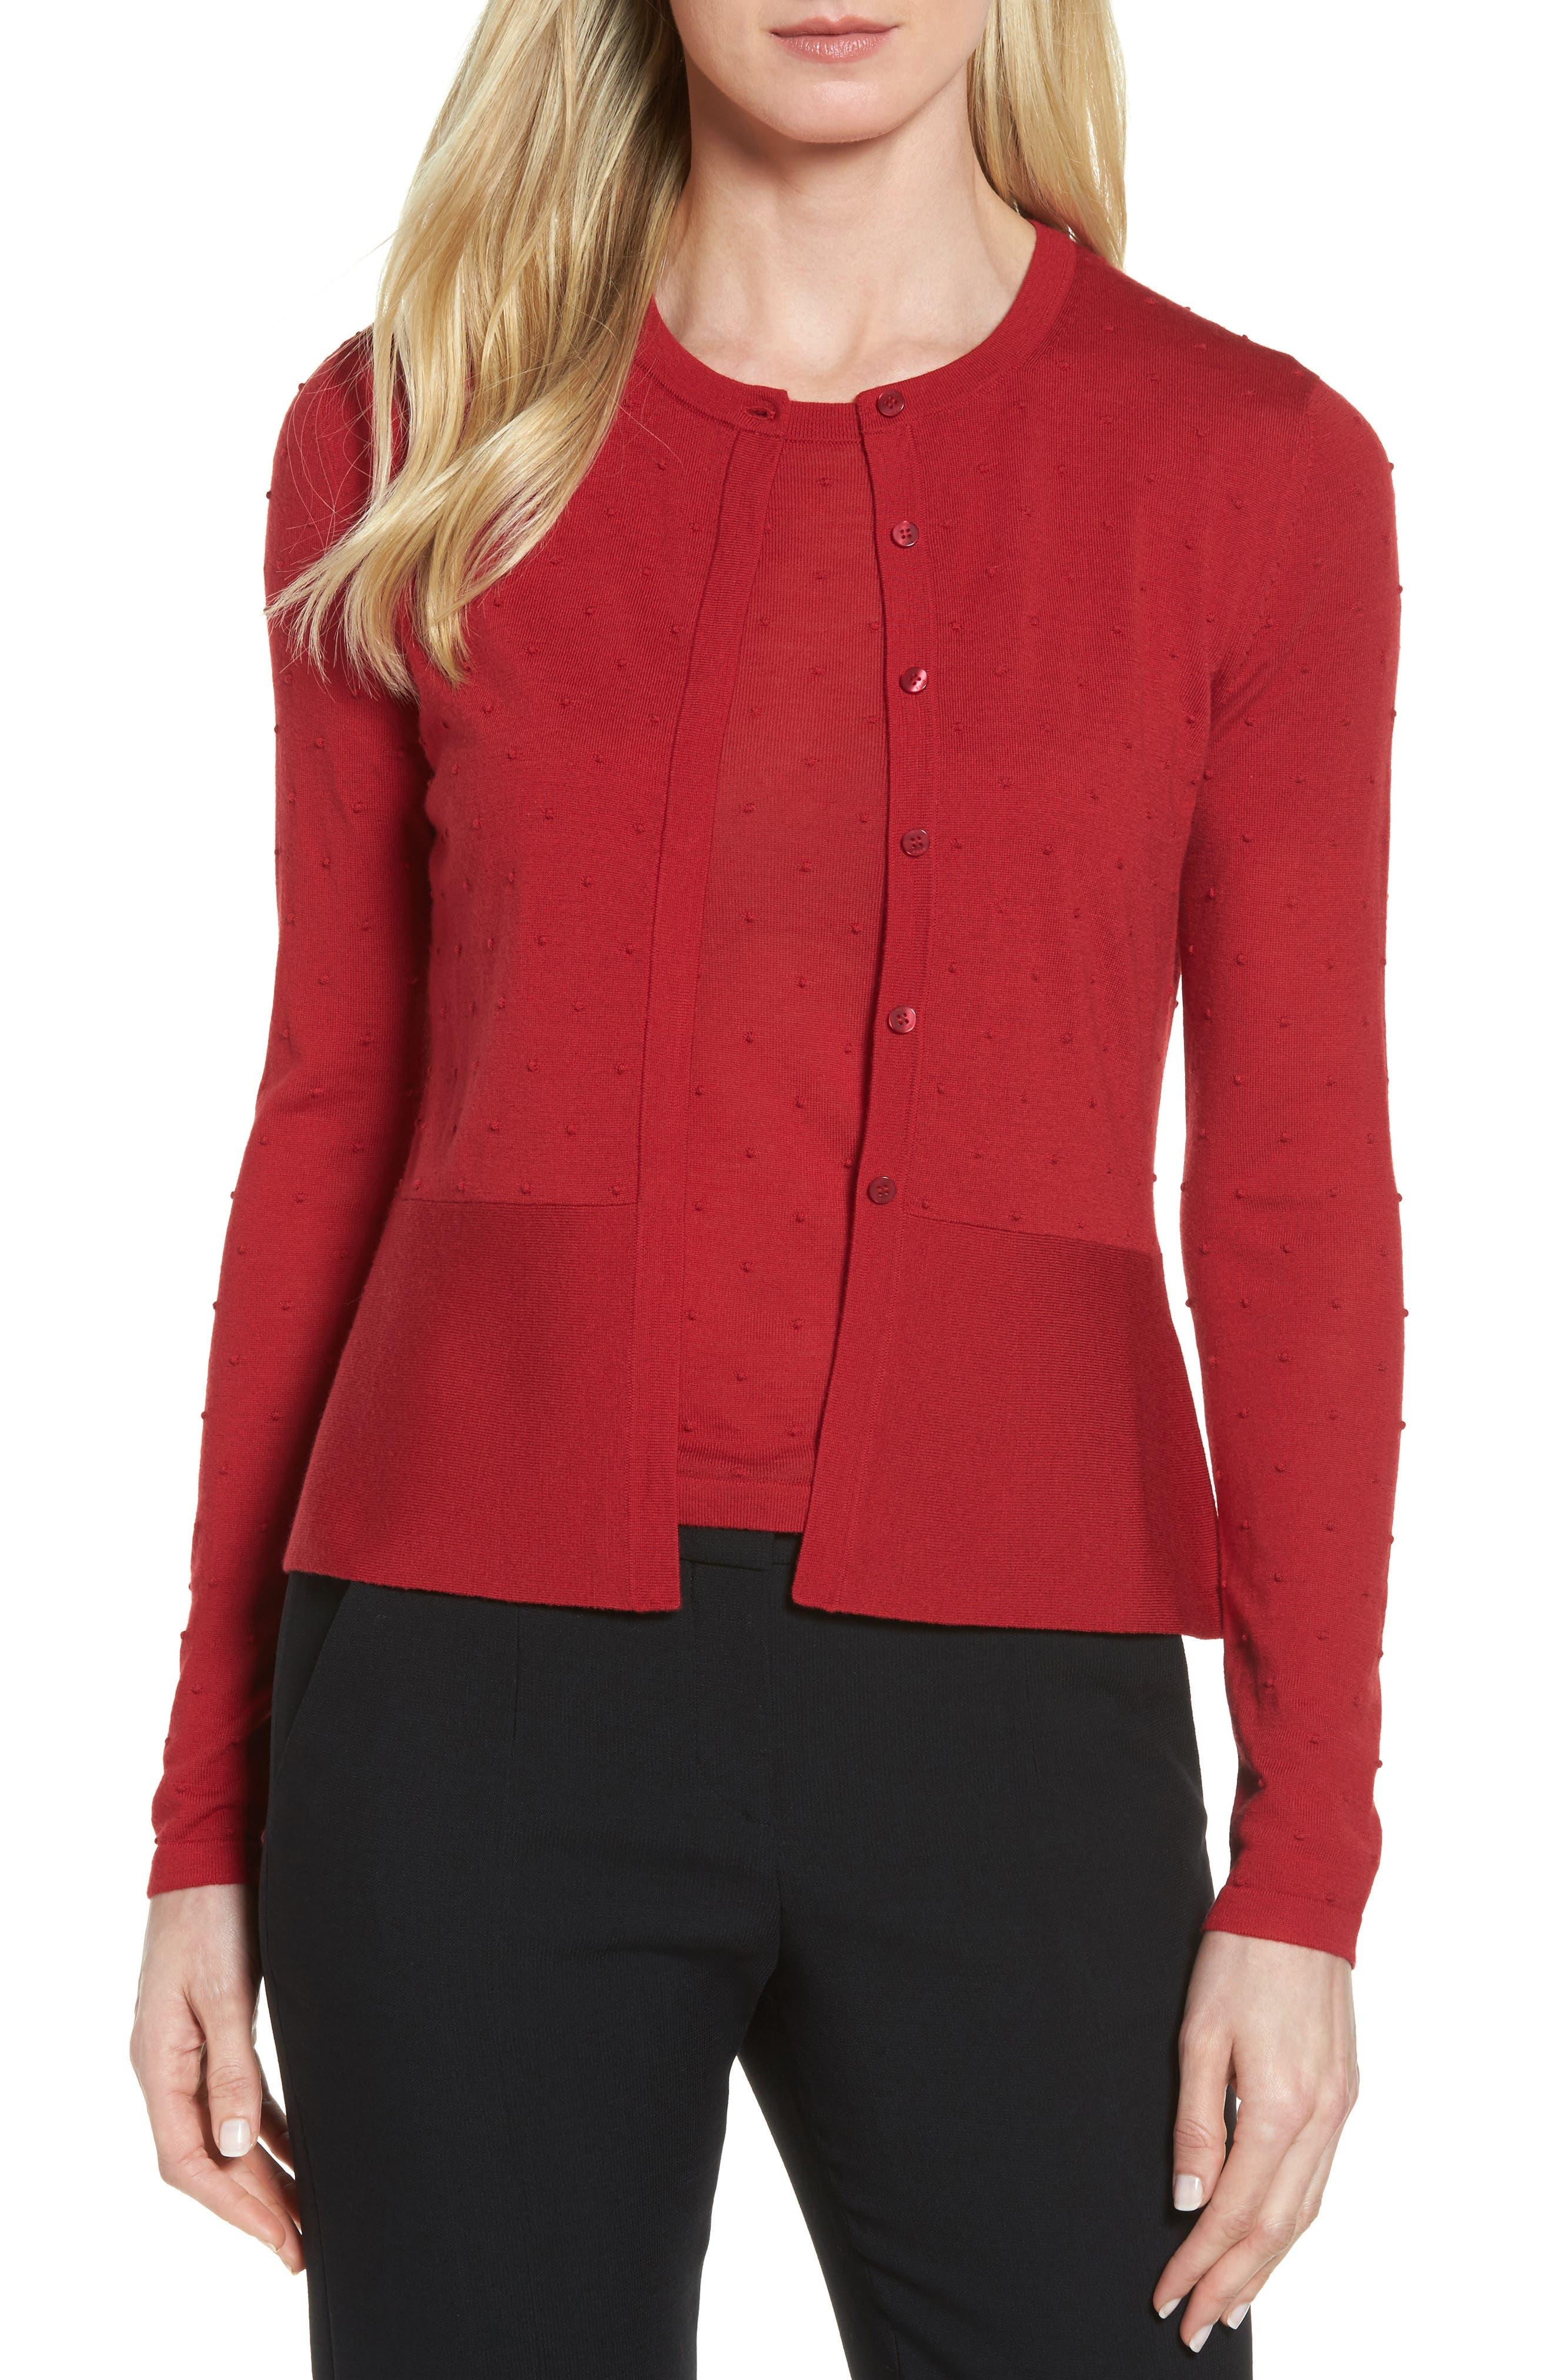 Faithe Wool Dot Jacquard Cardigan,                         Main,                         color, Pomegranate